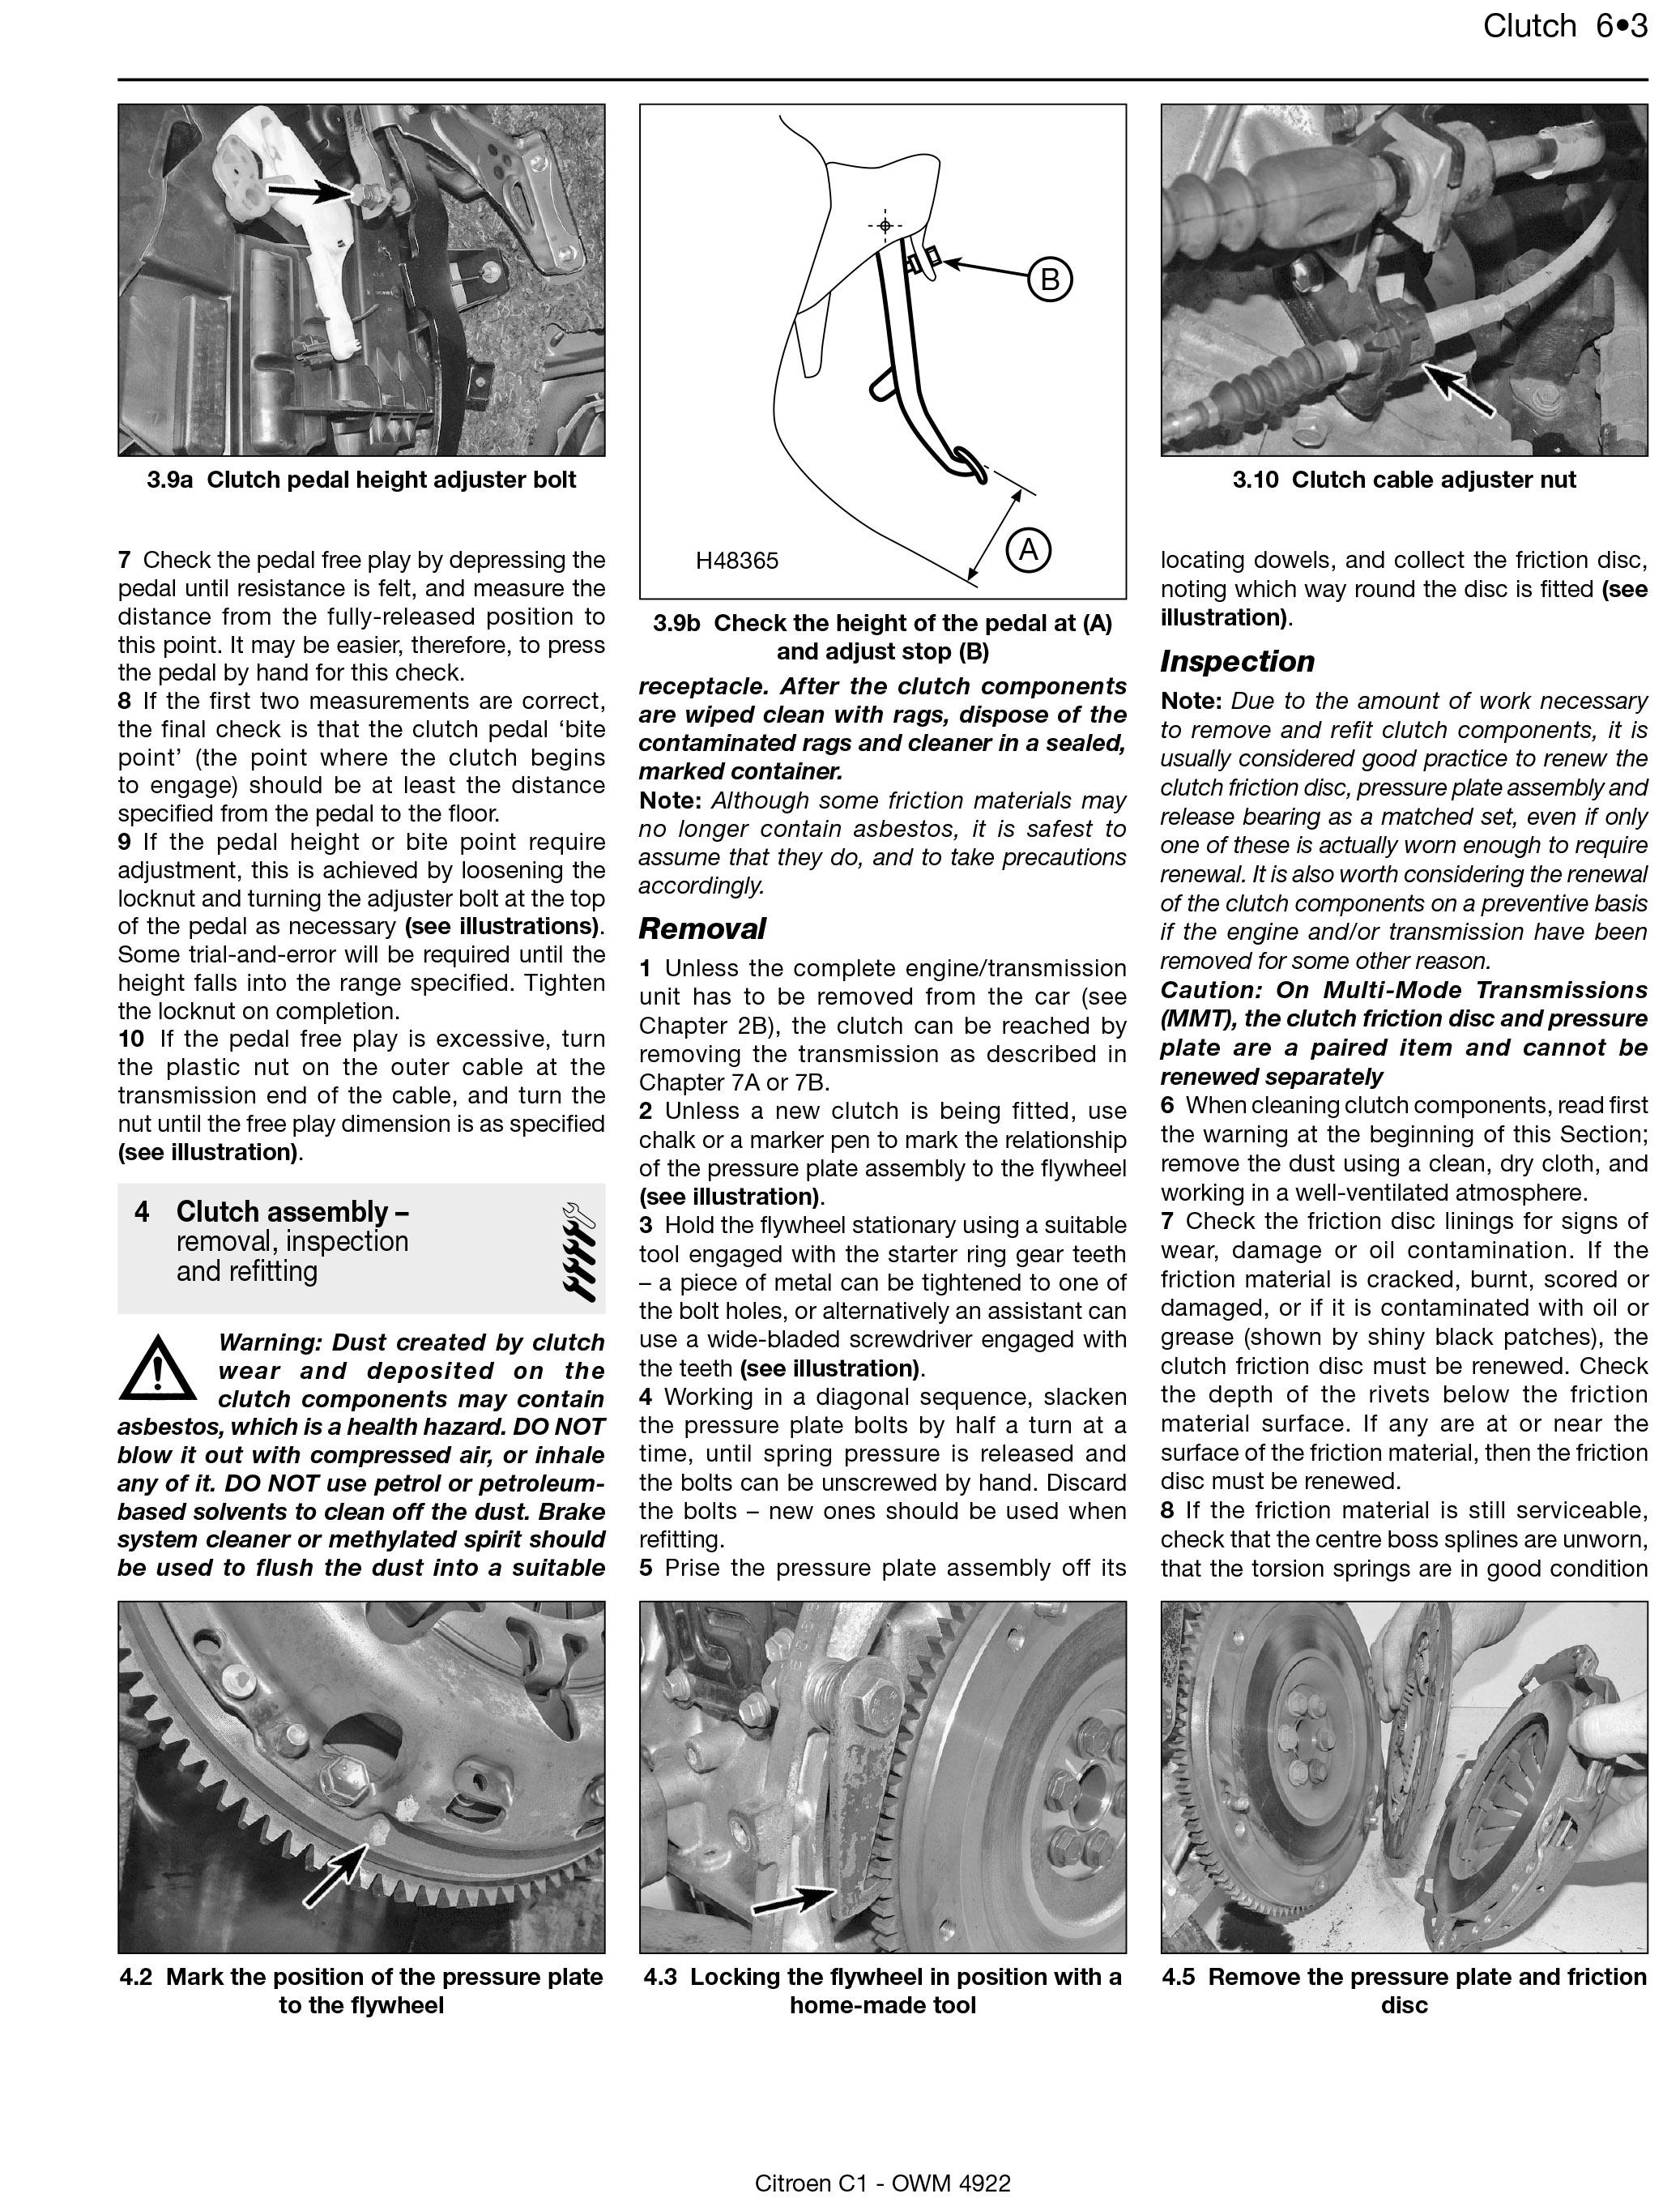 citroen c1 petrol 05 11 haynes repair manual haynes publishing rh haynes com Citroen C4 Citroen C6